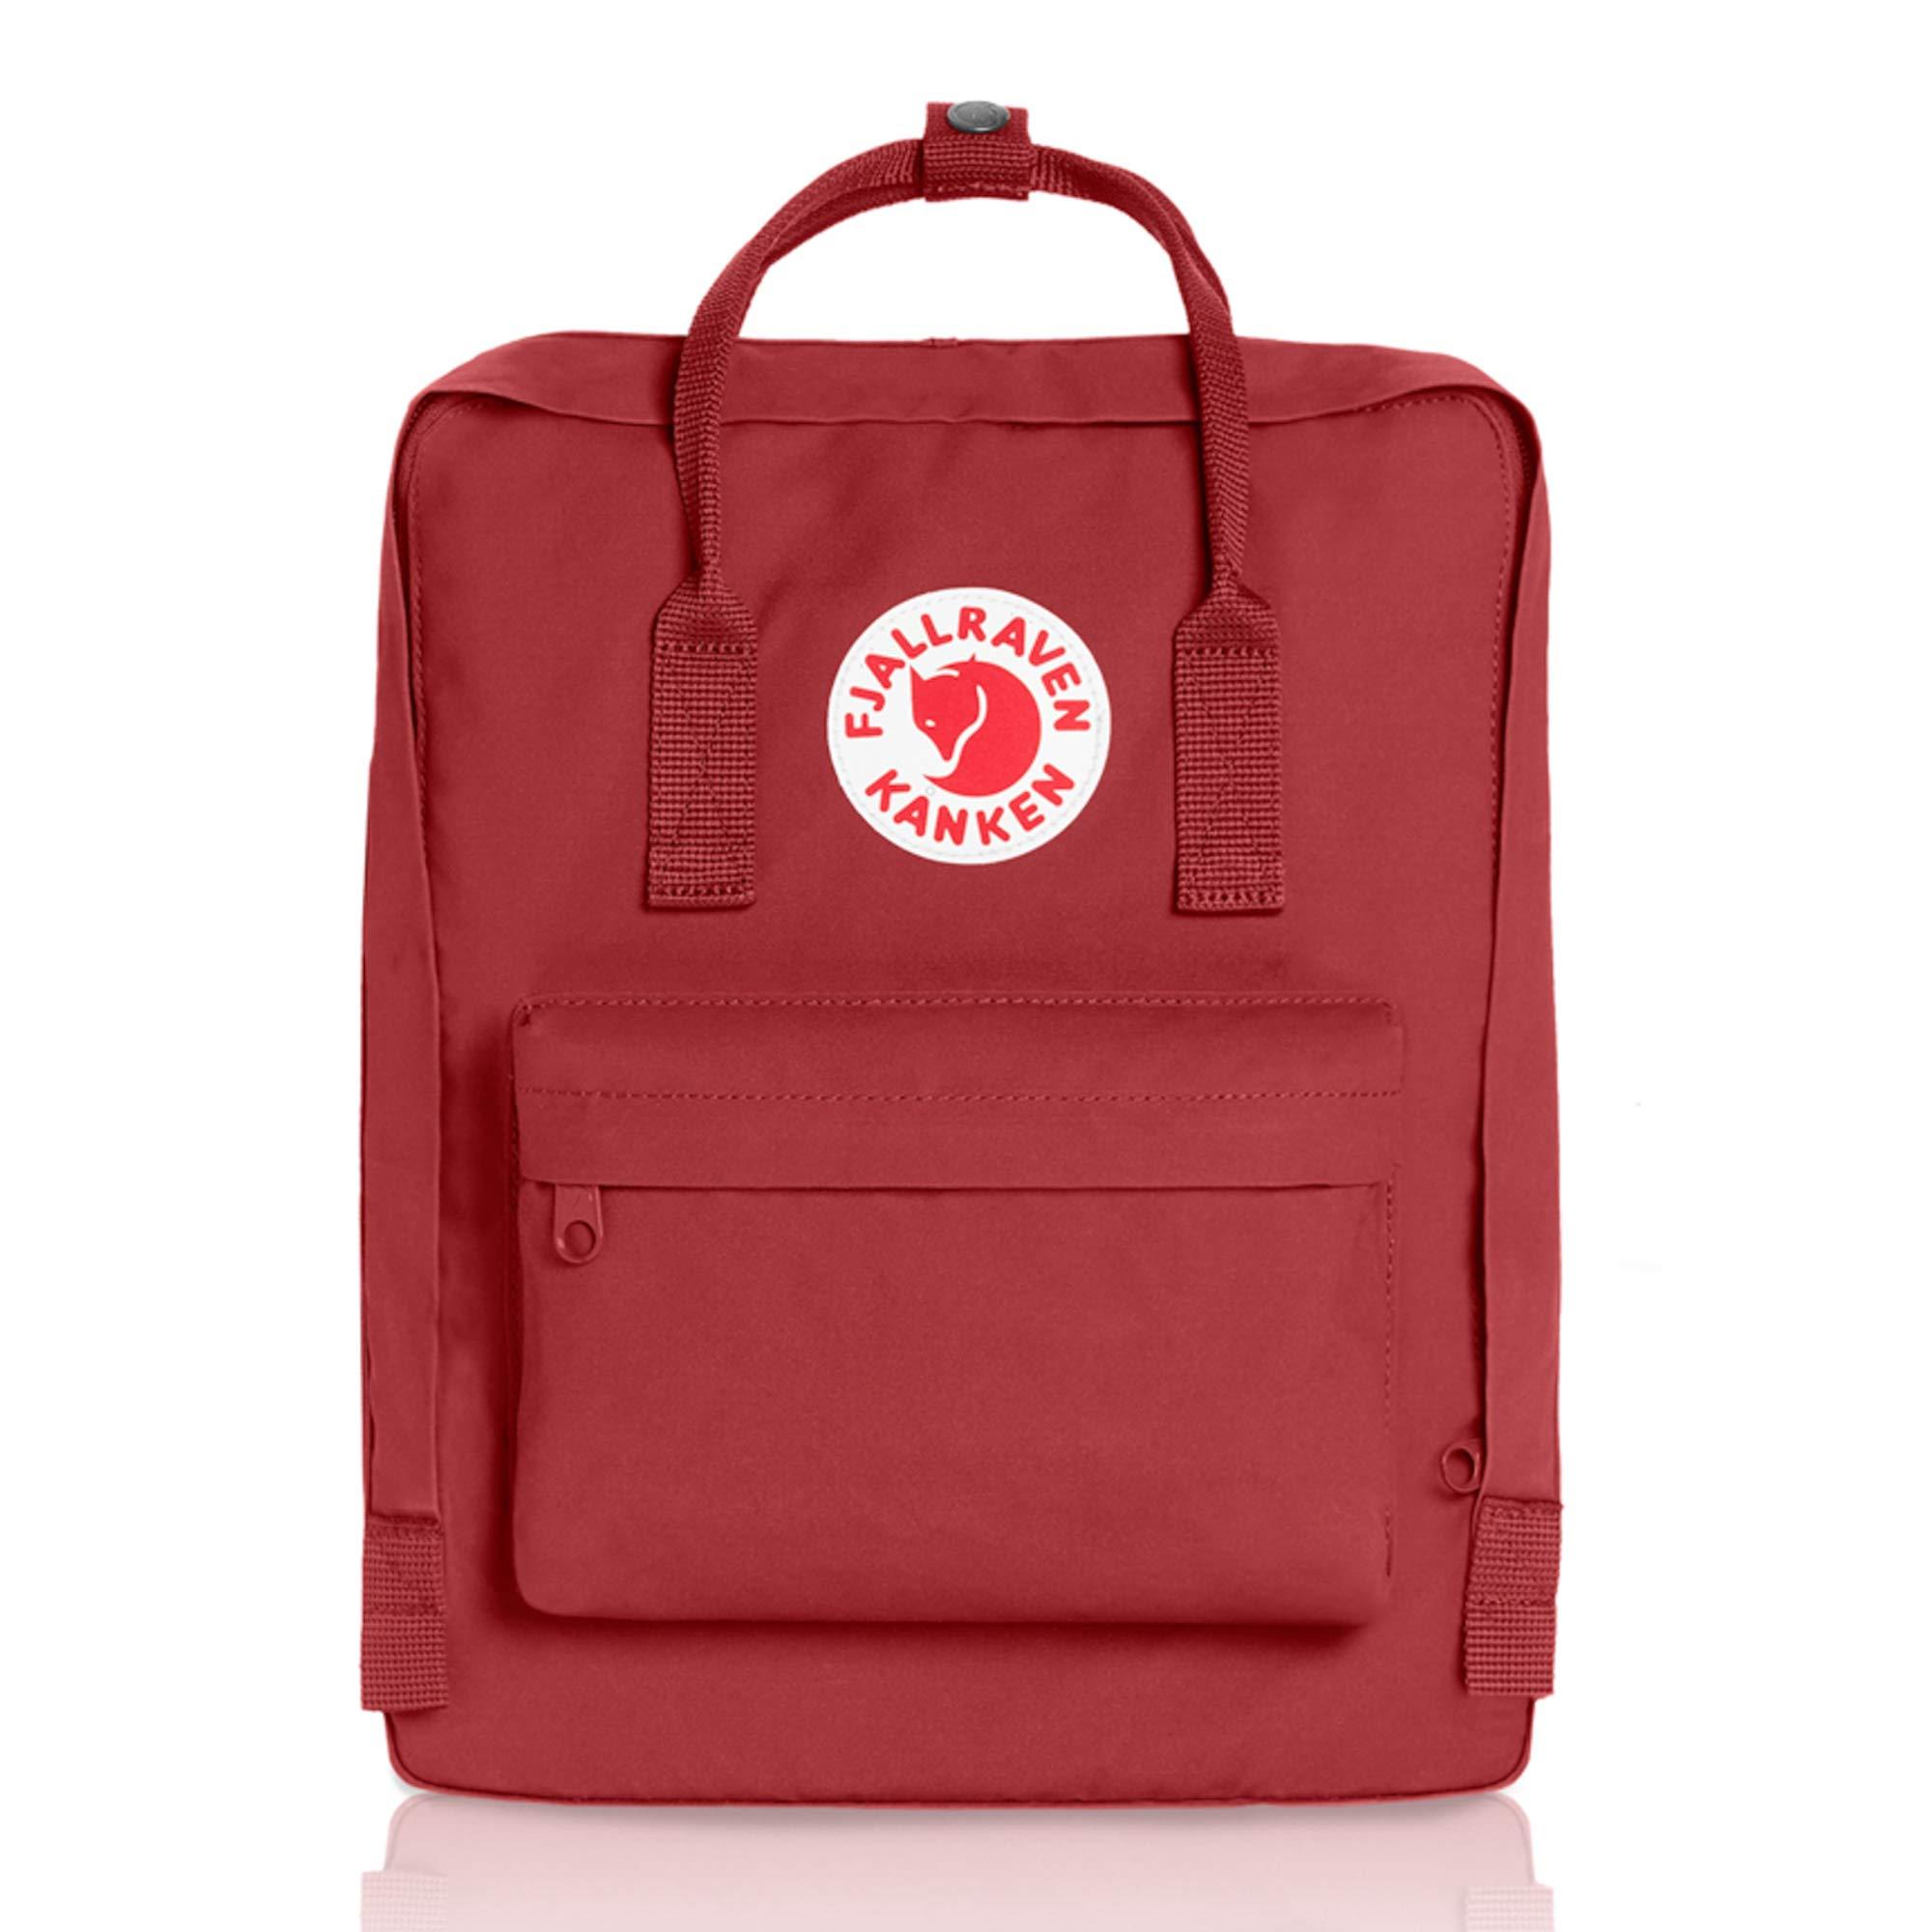 Fjallraven - Kanken Classic Backpack for Everyday, Deep Red by Fjallraven (Image #1)